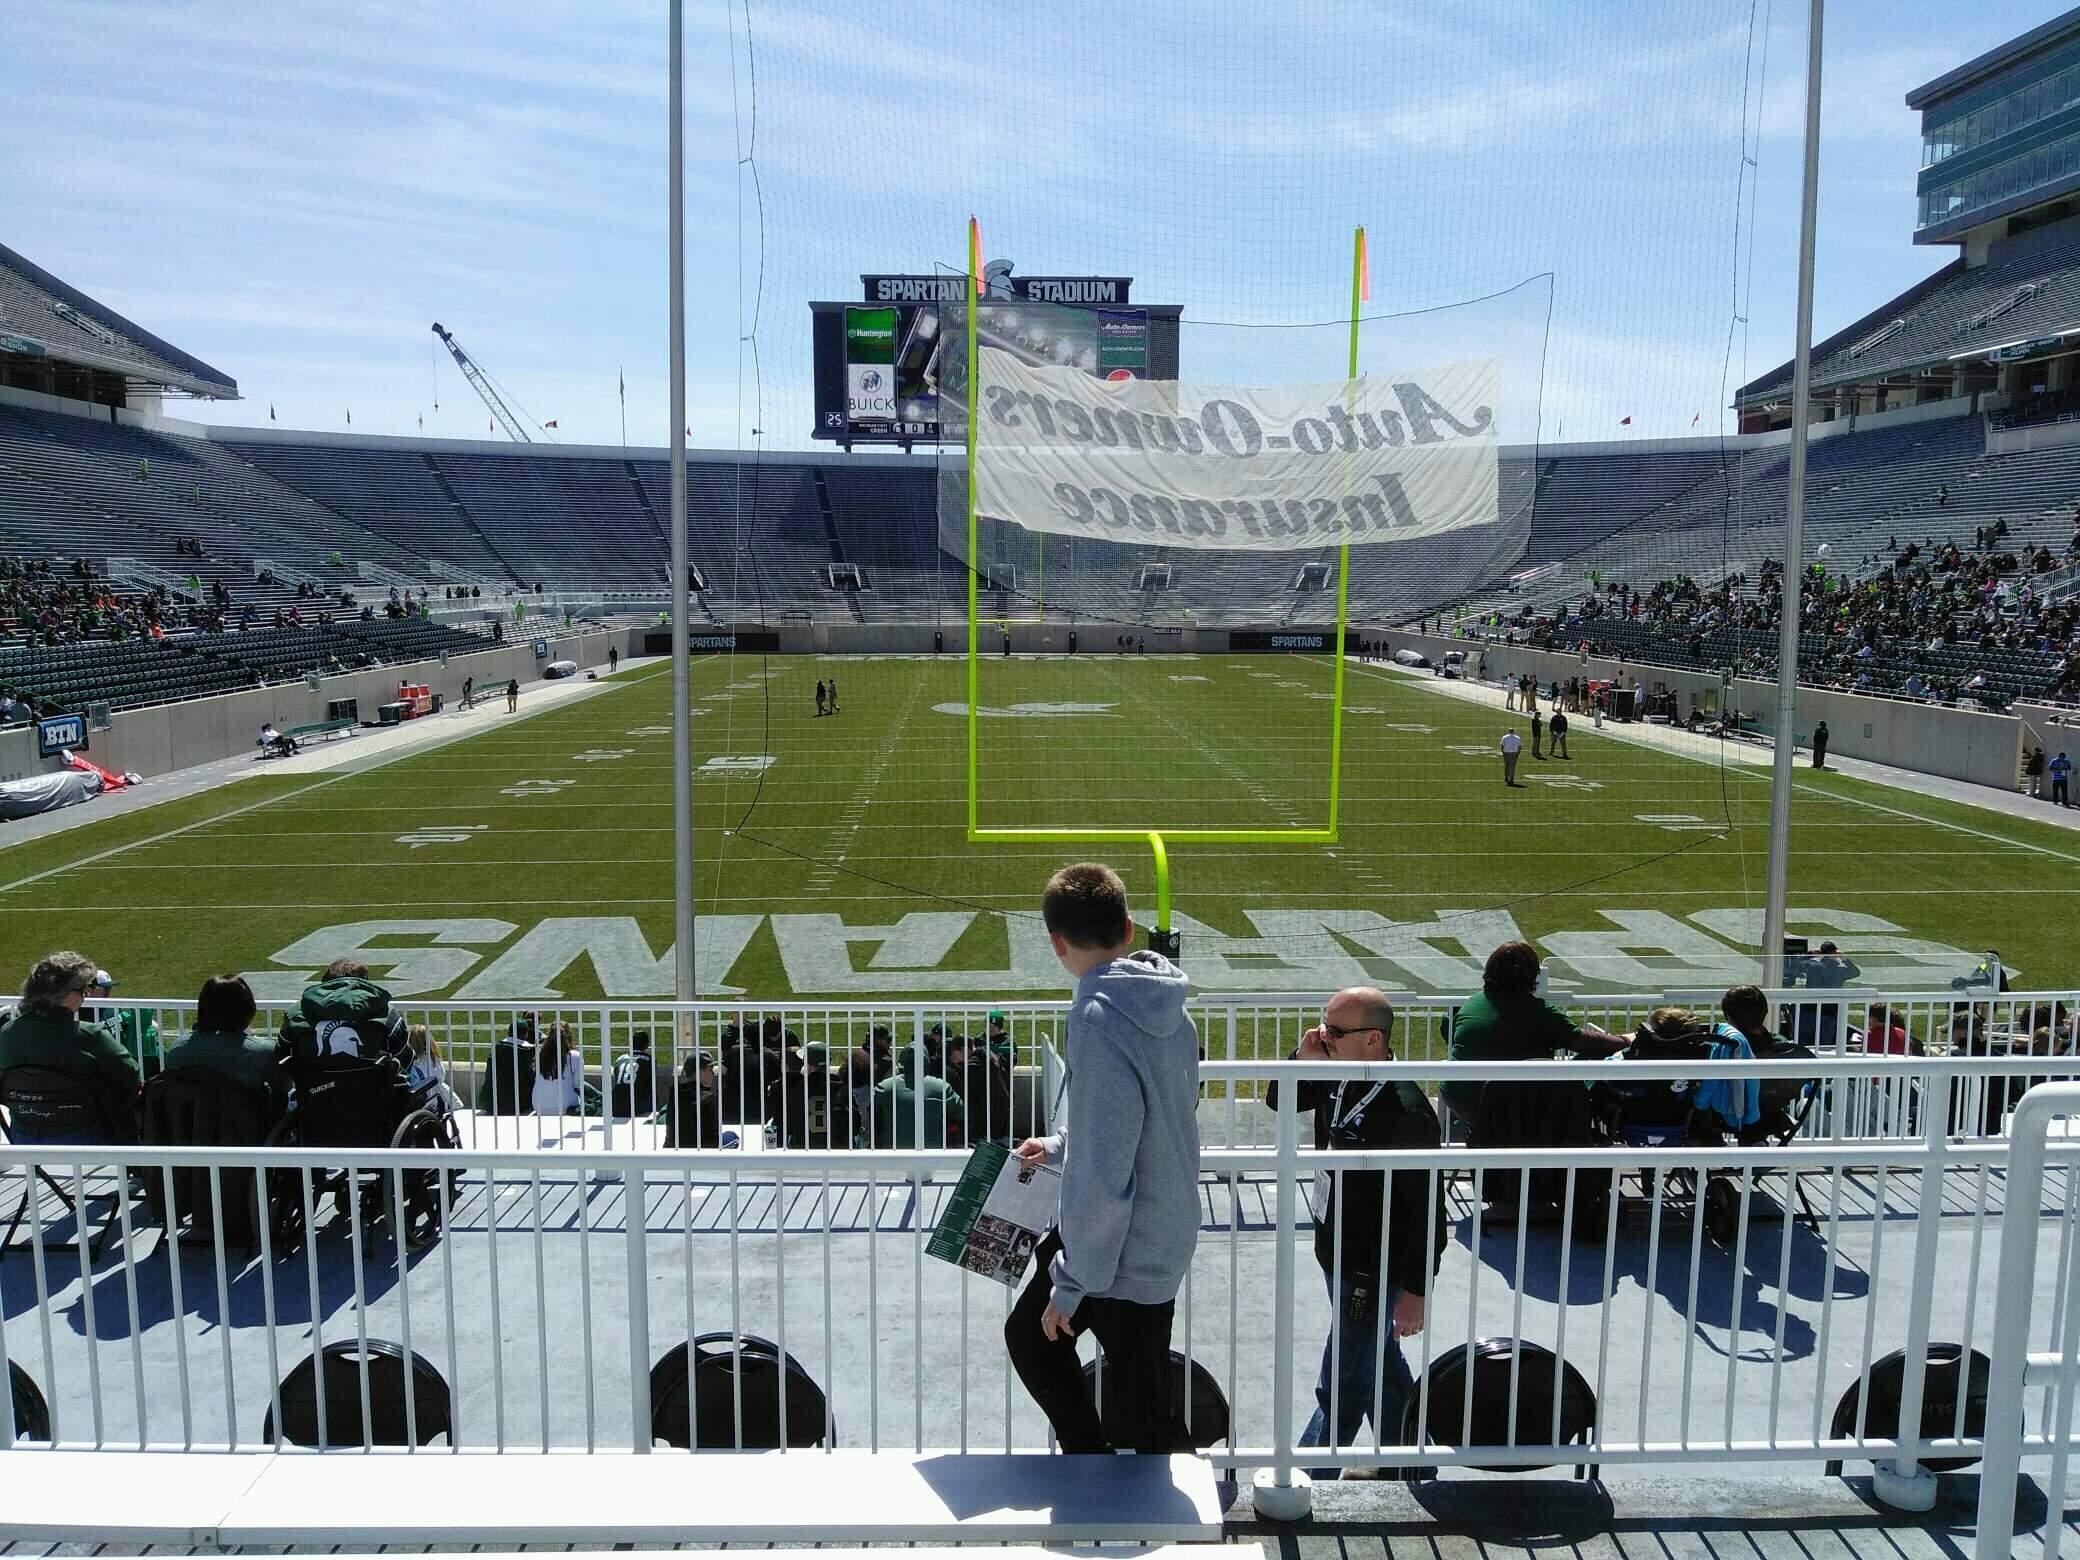 Spartan Stadium Section 1 Row 24 Seat 42